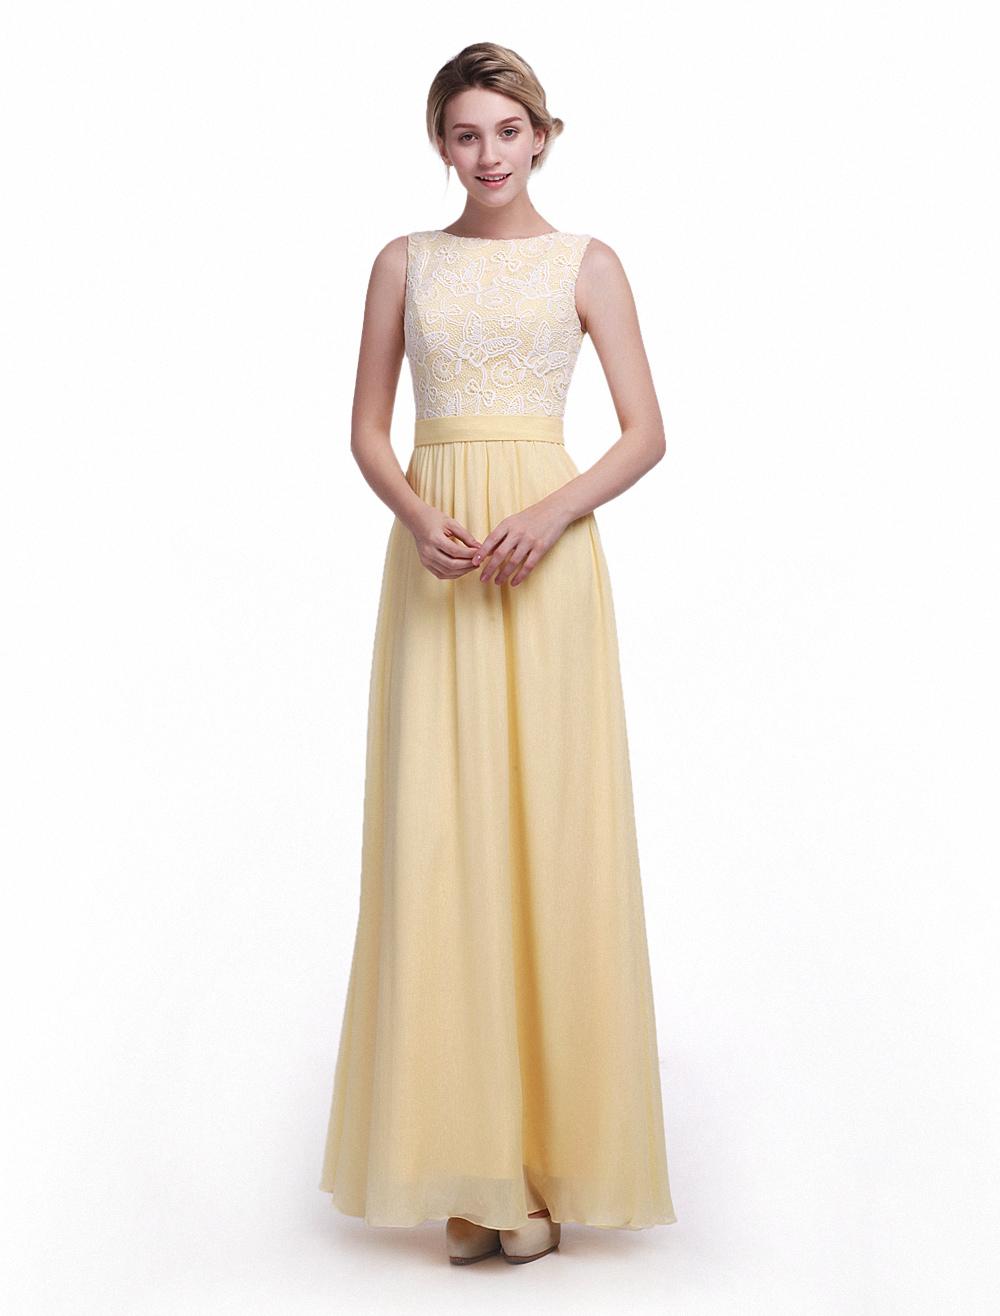 Daffodil Sash A-line Floor-Length Bridesmaid Dress with Elegant Jewel Neck  Milanoo